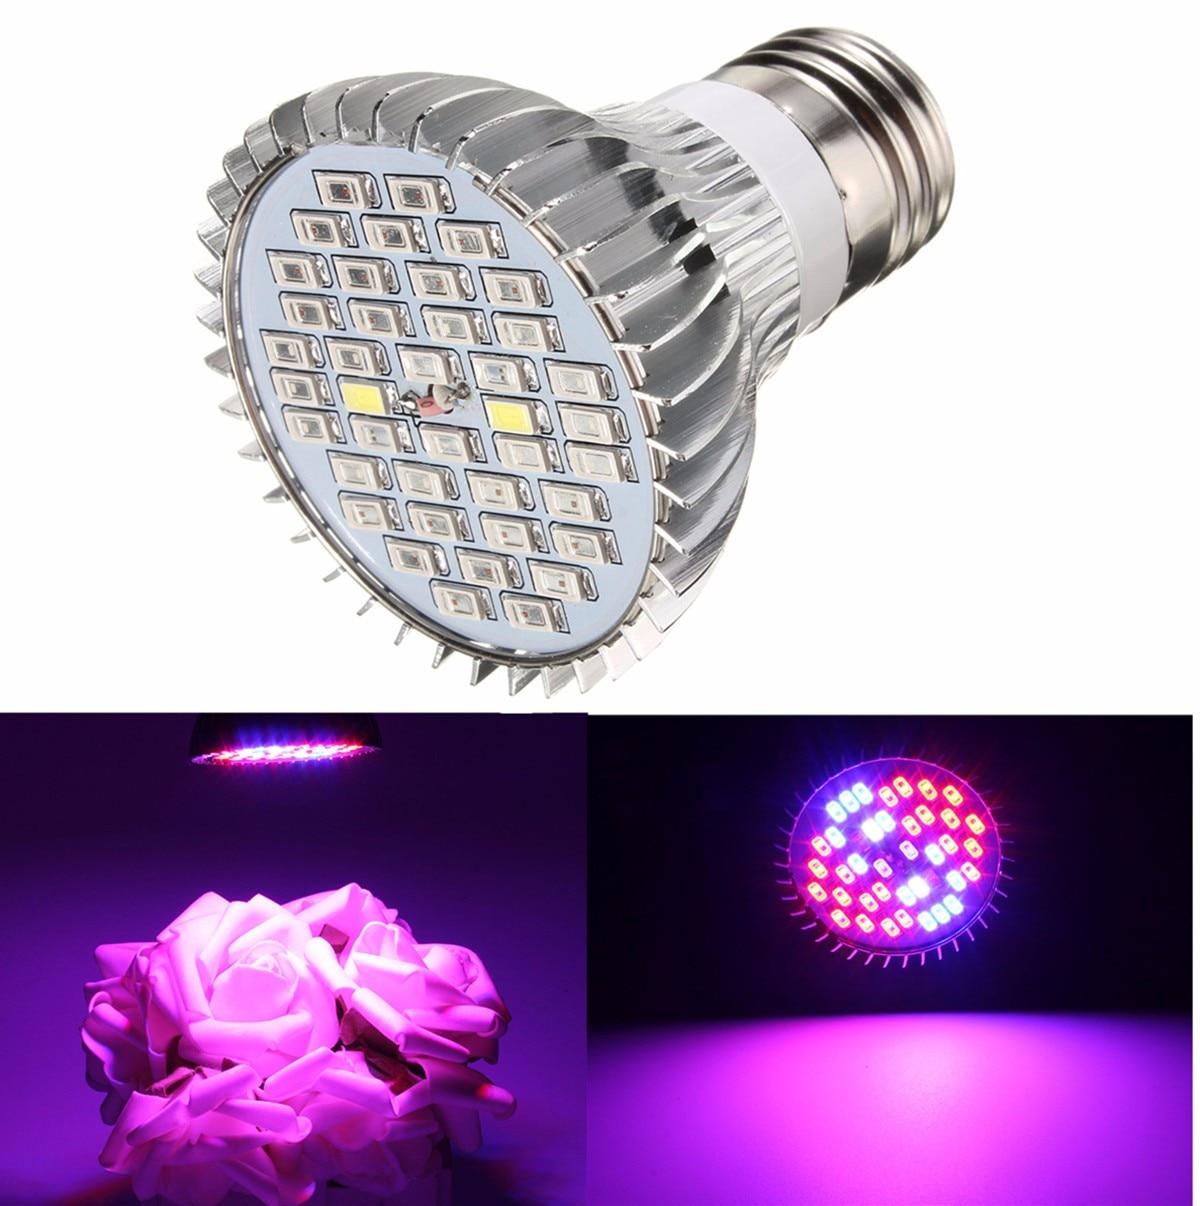 Mising 15W E27 Full Spectrum LED Plant Grow Lights Bulb Veg Hydroponic Lamps Flower Hydroponics System Indoor Garden Greenhouse